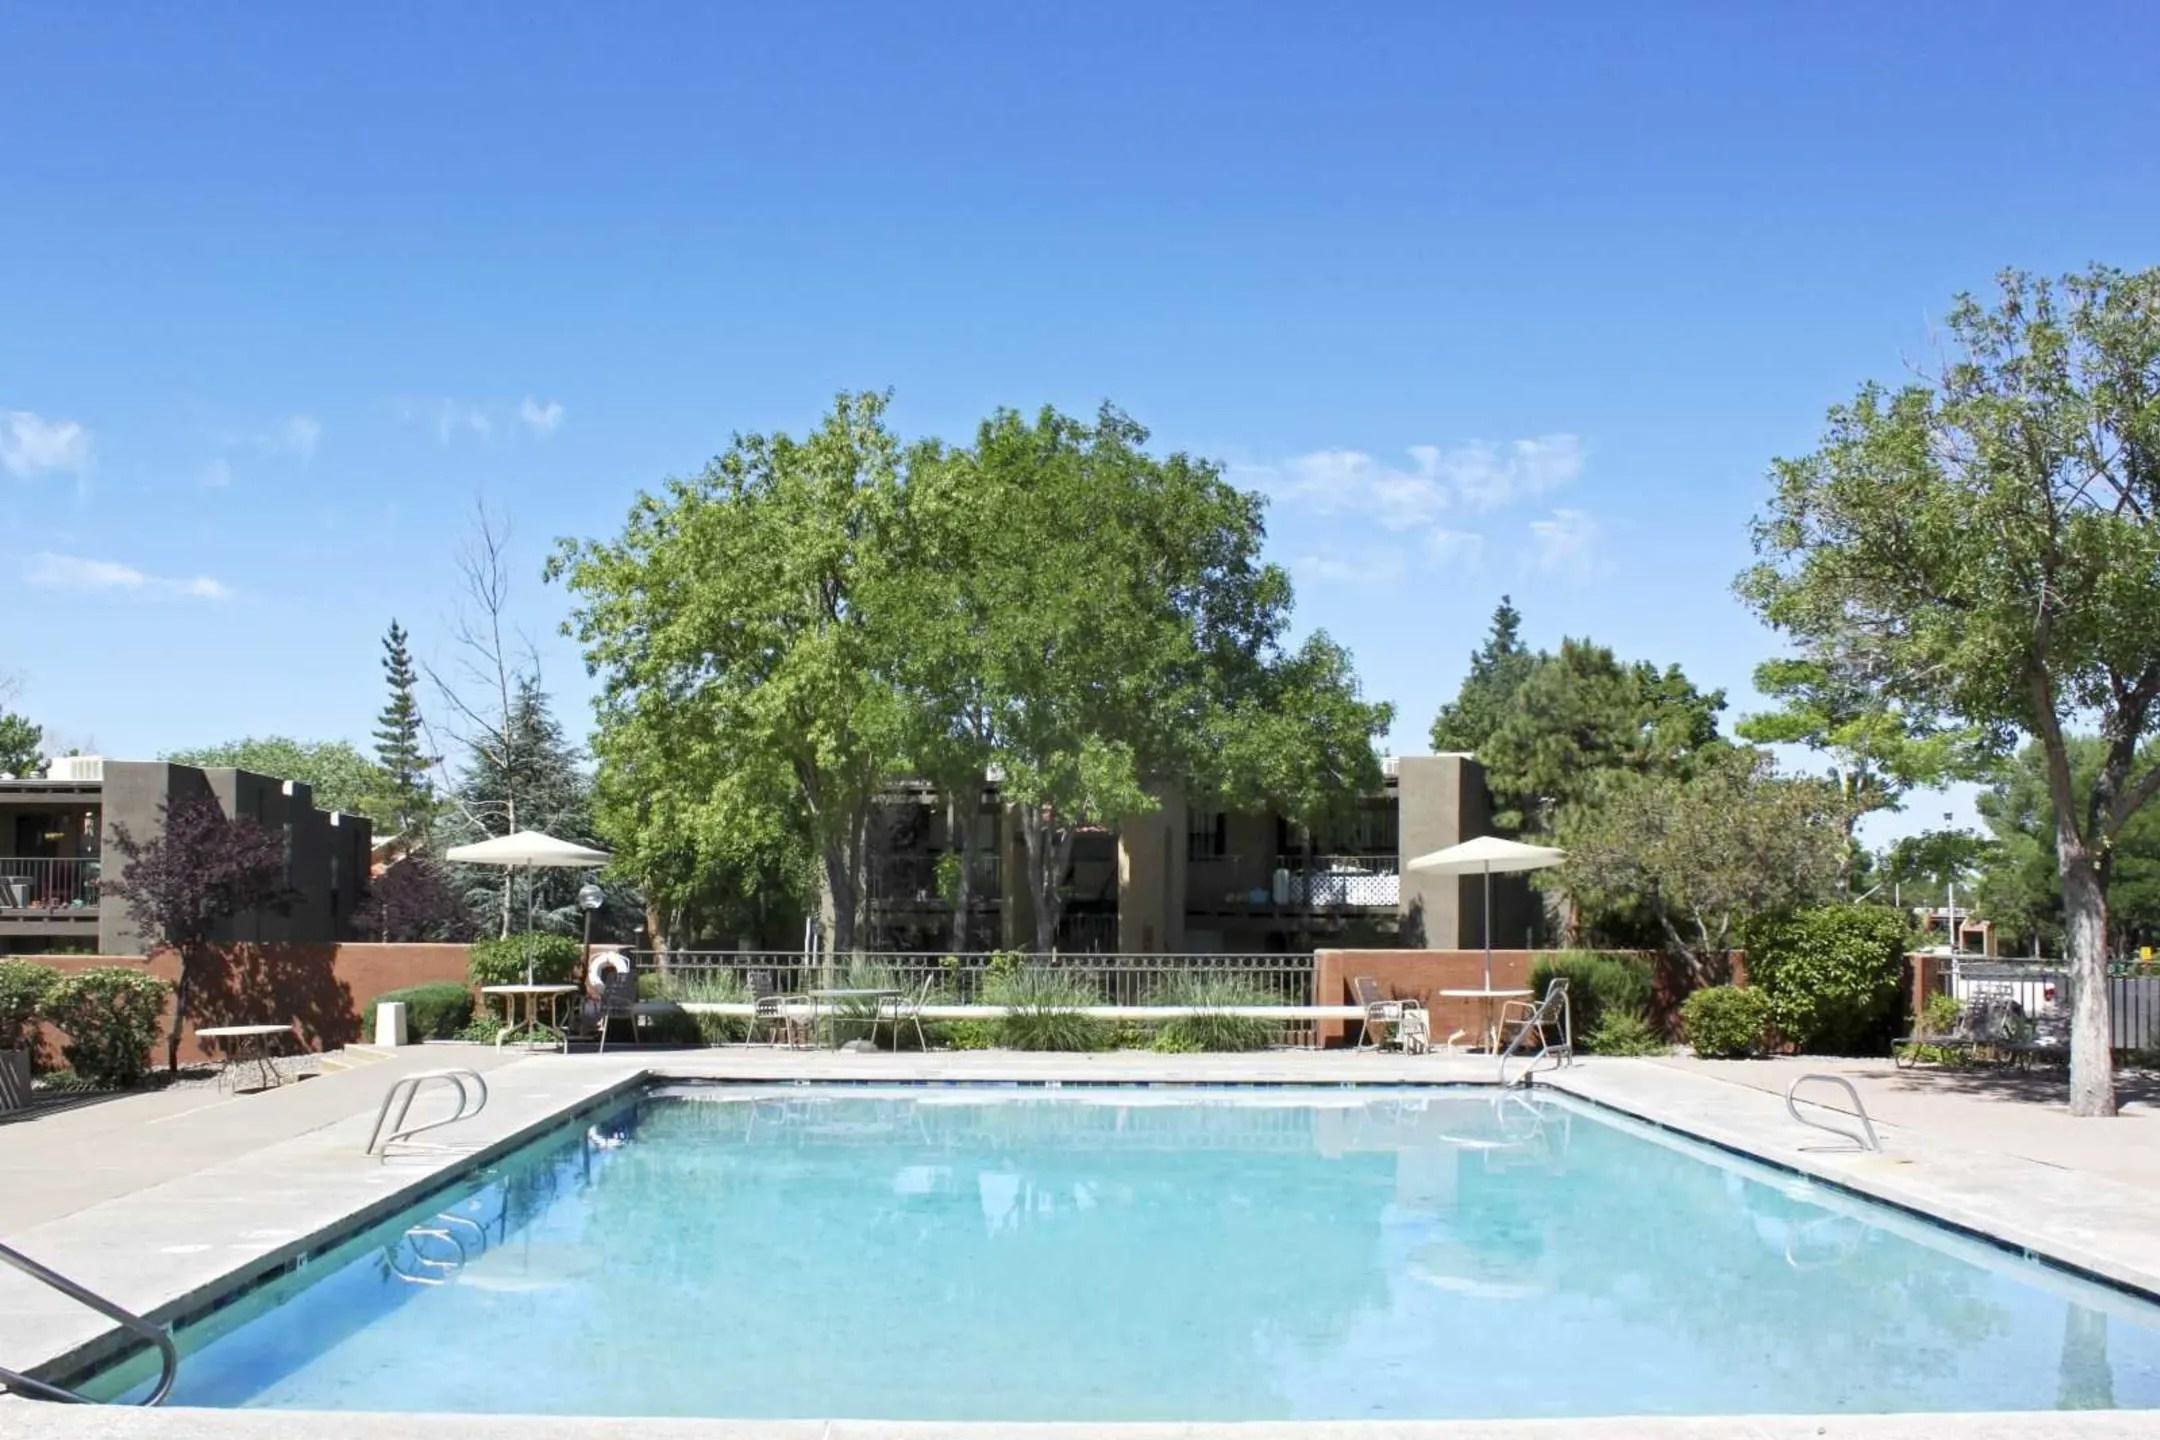 Spain Gardens Apartments  Albuquerque NM 87111